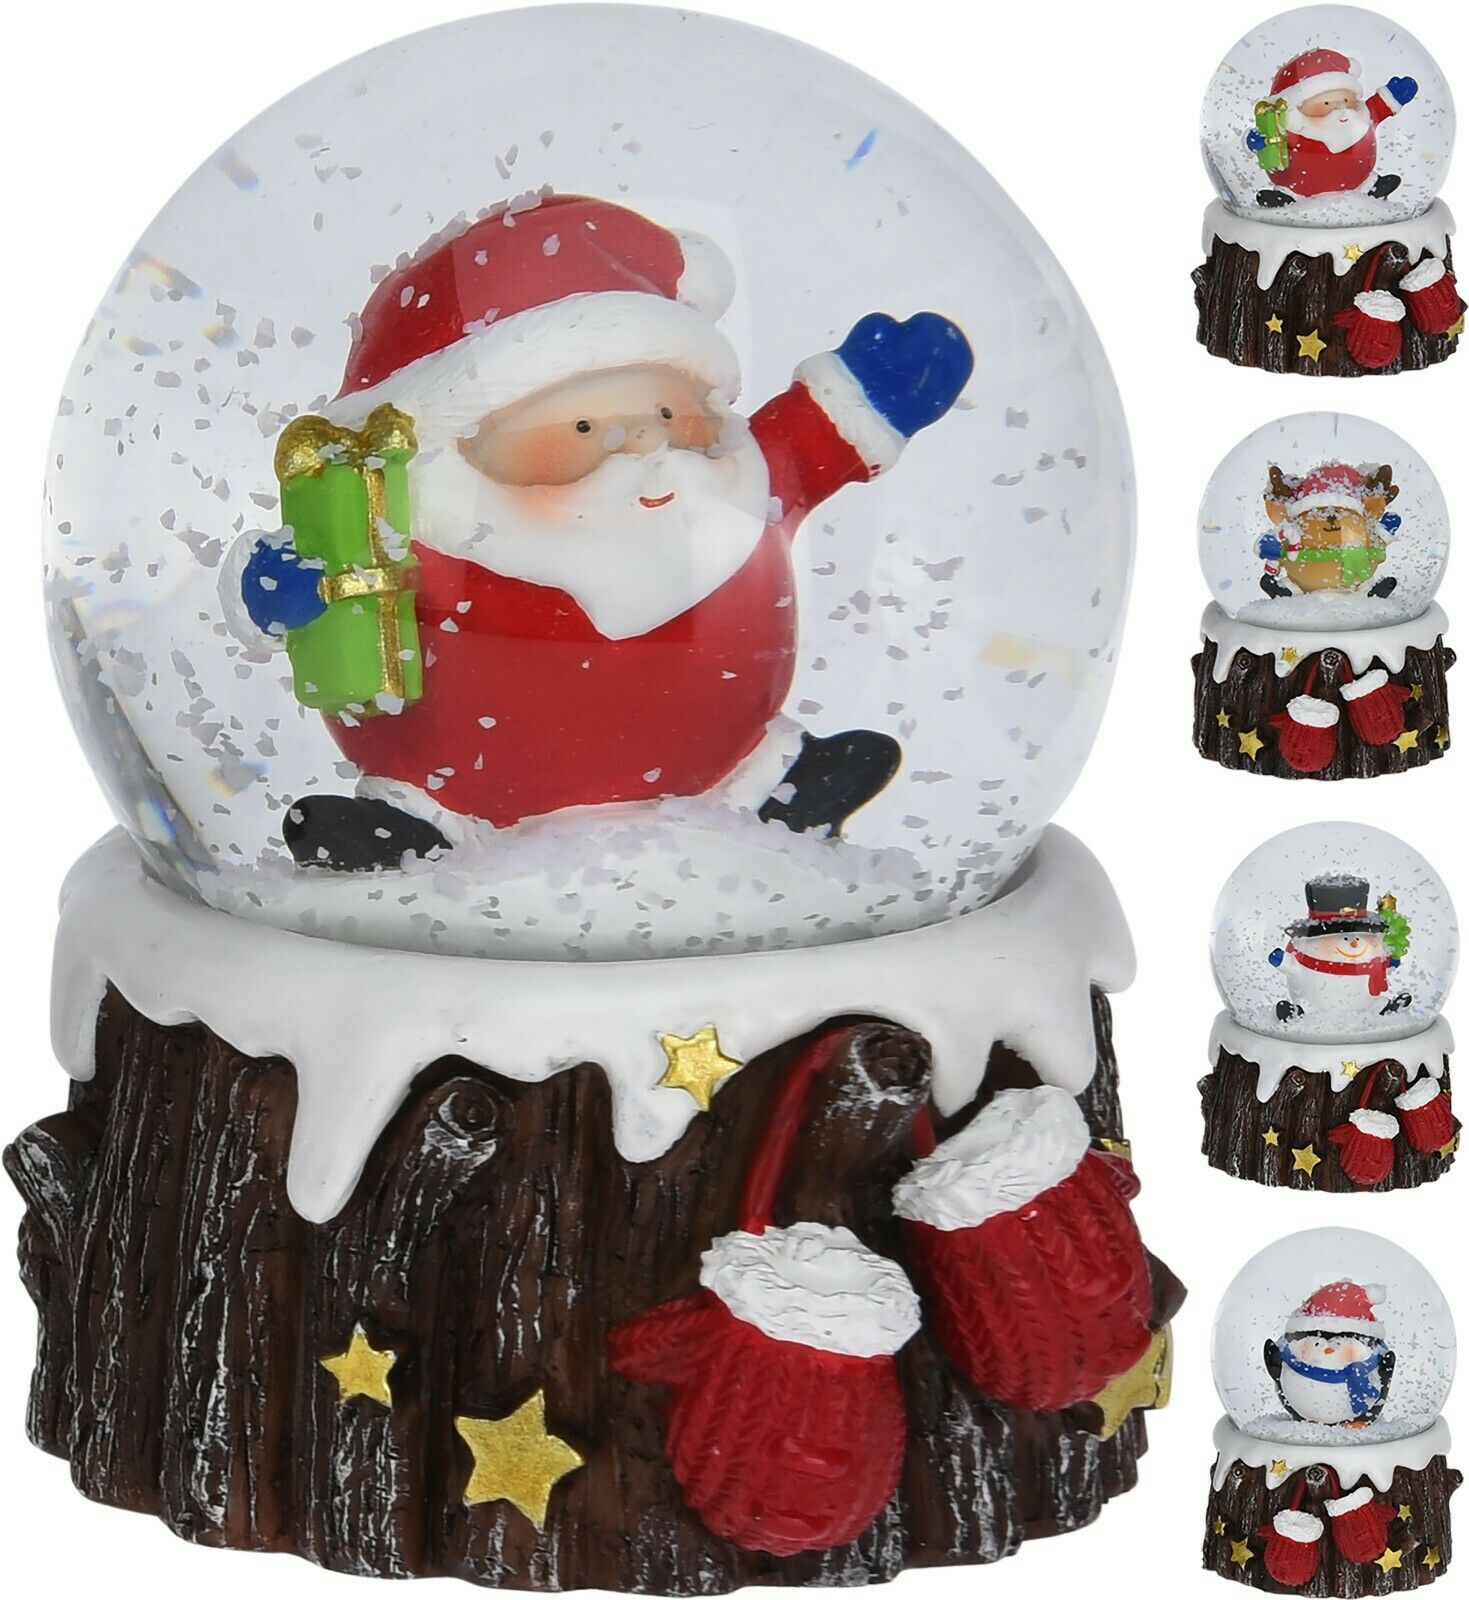 Christmas Snow Globe Xmas Decoration Santa Snowman Reindeer On Tree Trunk Gift Ebay